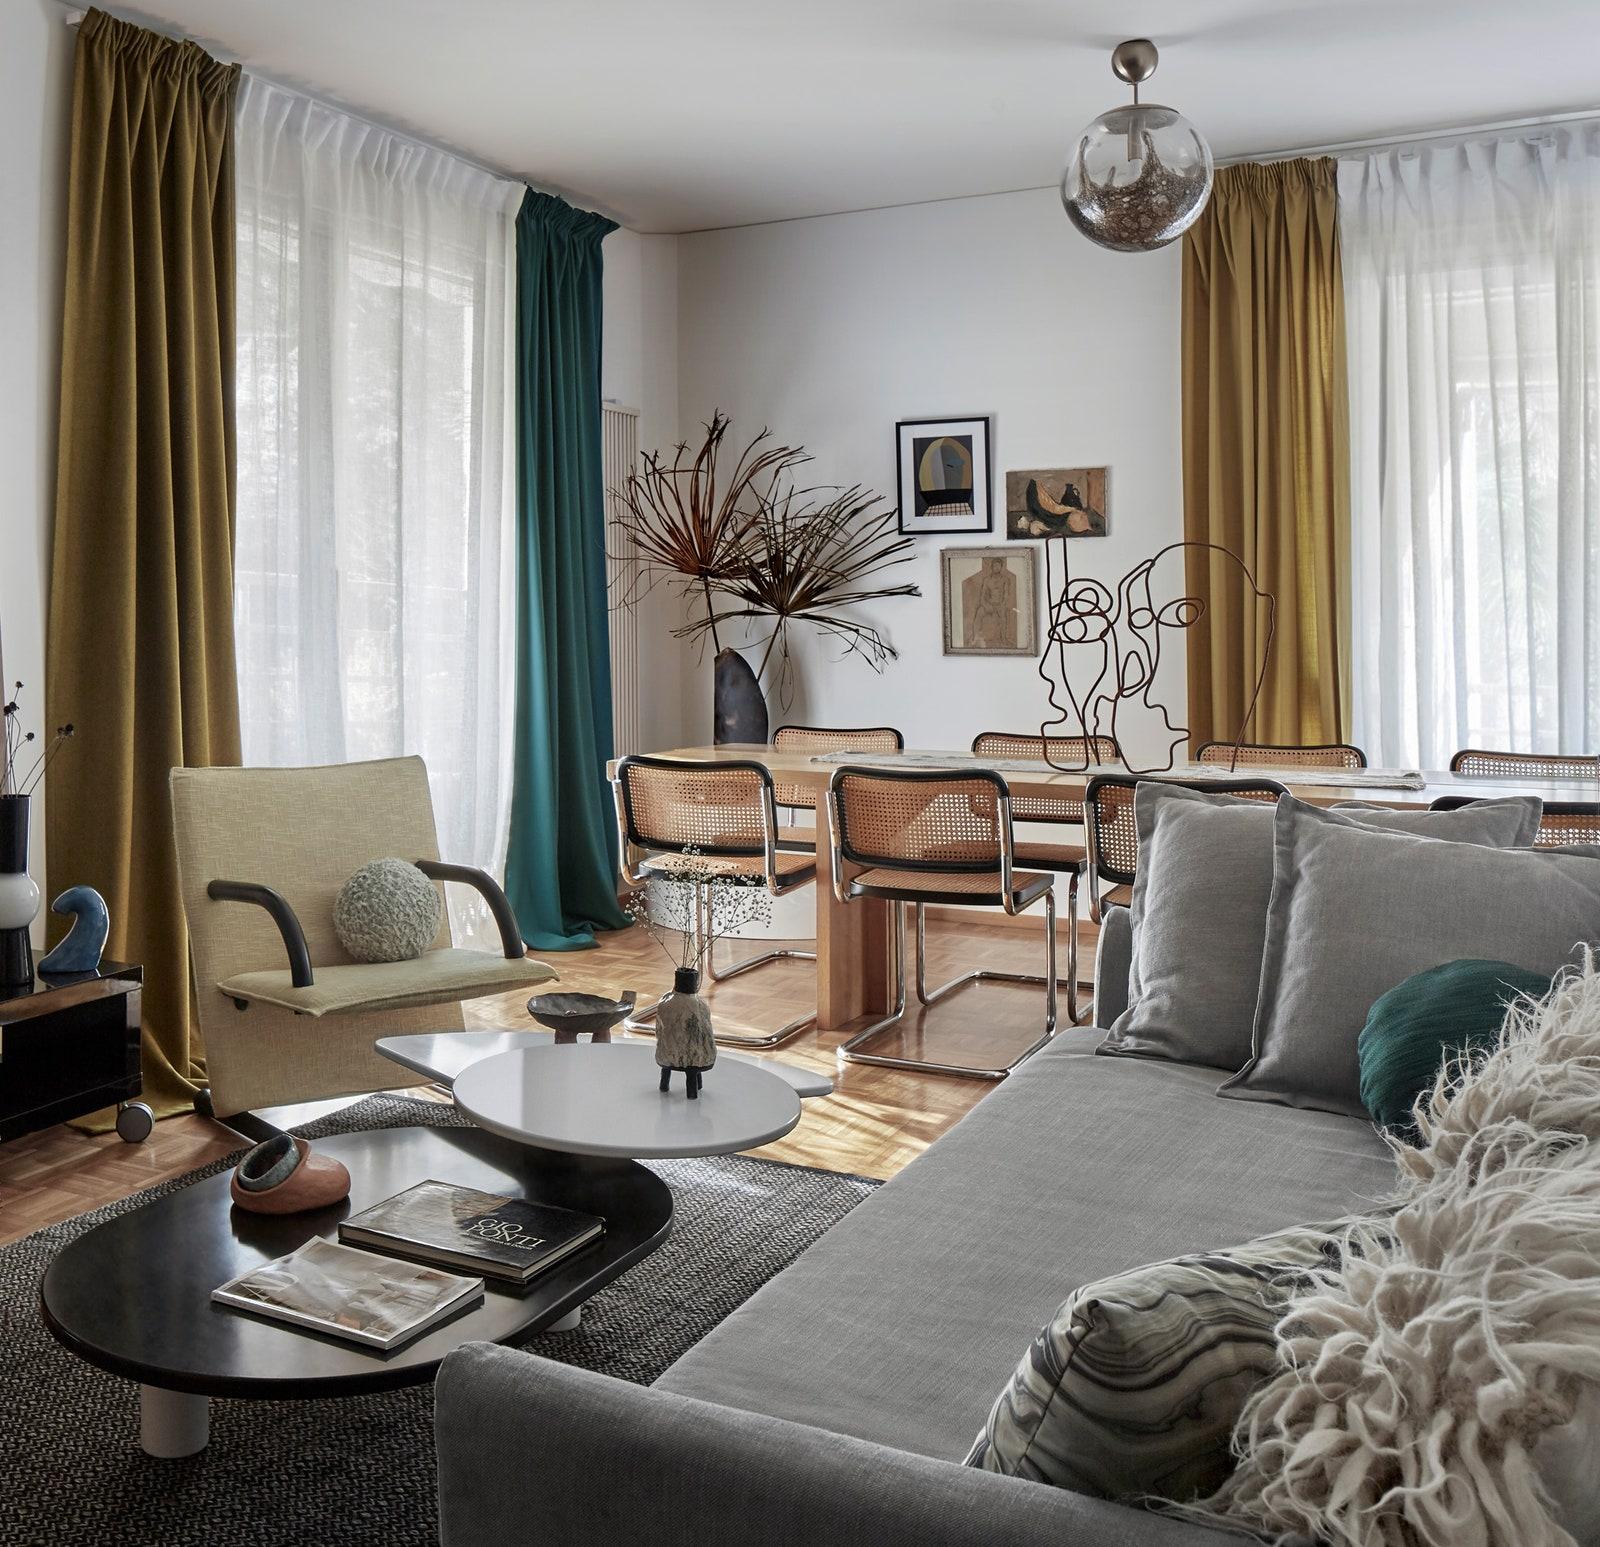 .  IKEA  Poppy Lawman  Burkhard Vogtherr  Arflex  80.            80 .             .      70       .  Vandra Rugs.    ...